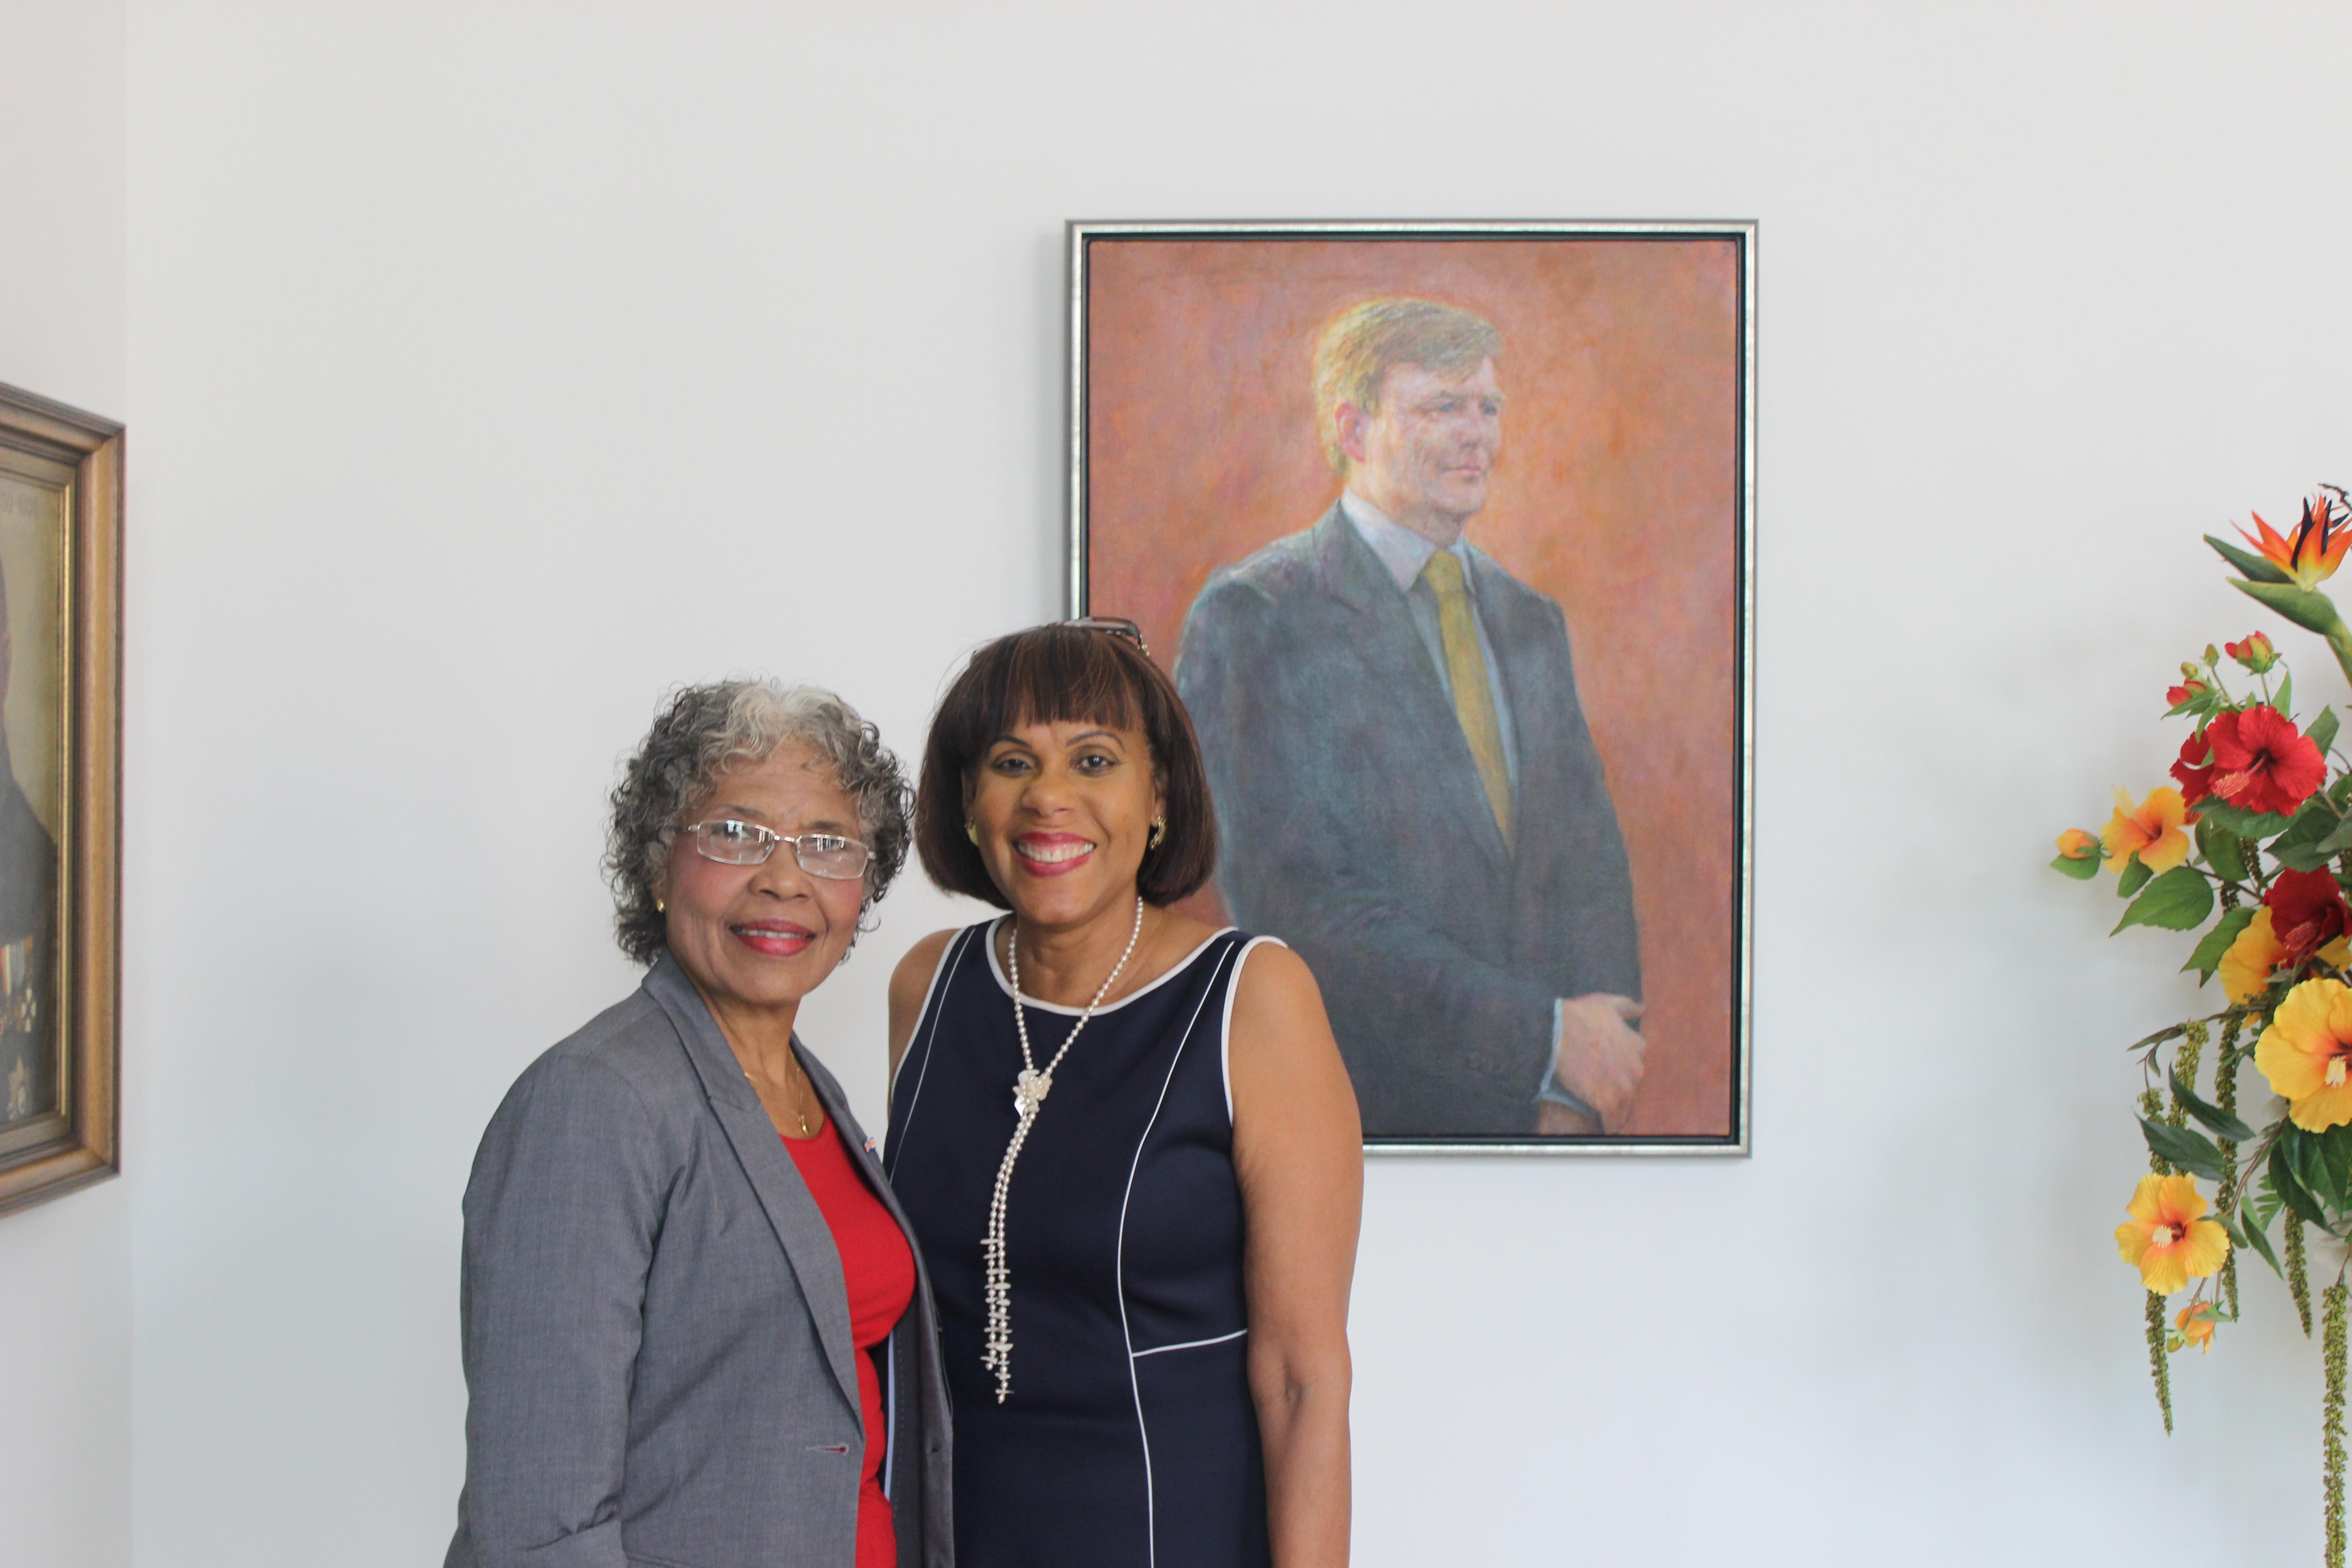 Mw Alba Martijn nam als Ombudsman op 30 juni op Fort Amsterdam afscheid van de Gouverneur van Curaçao, mw Lucille George-Wout